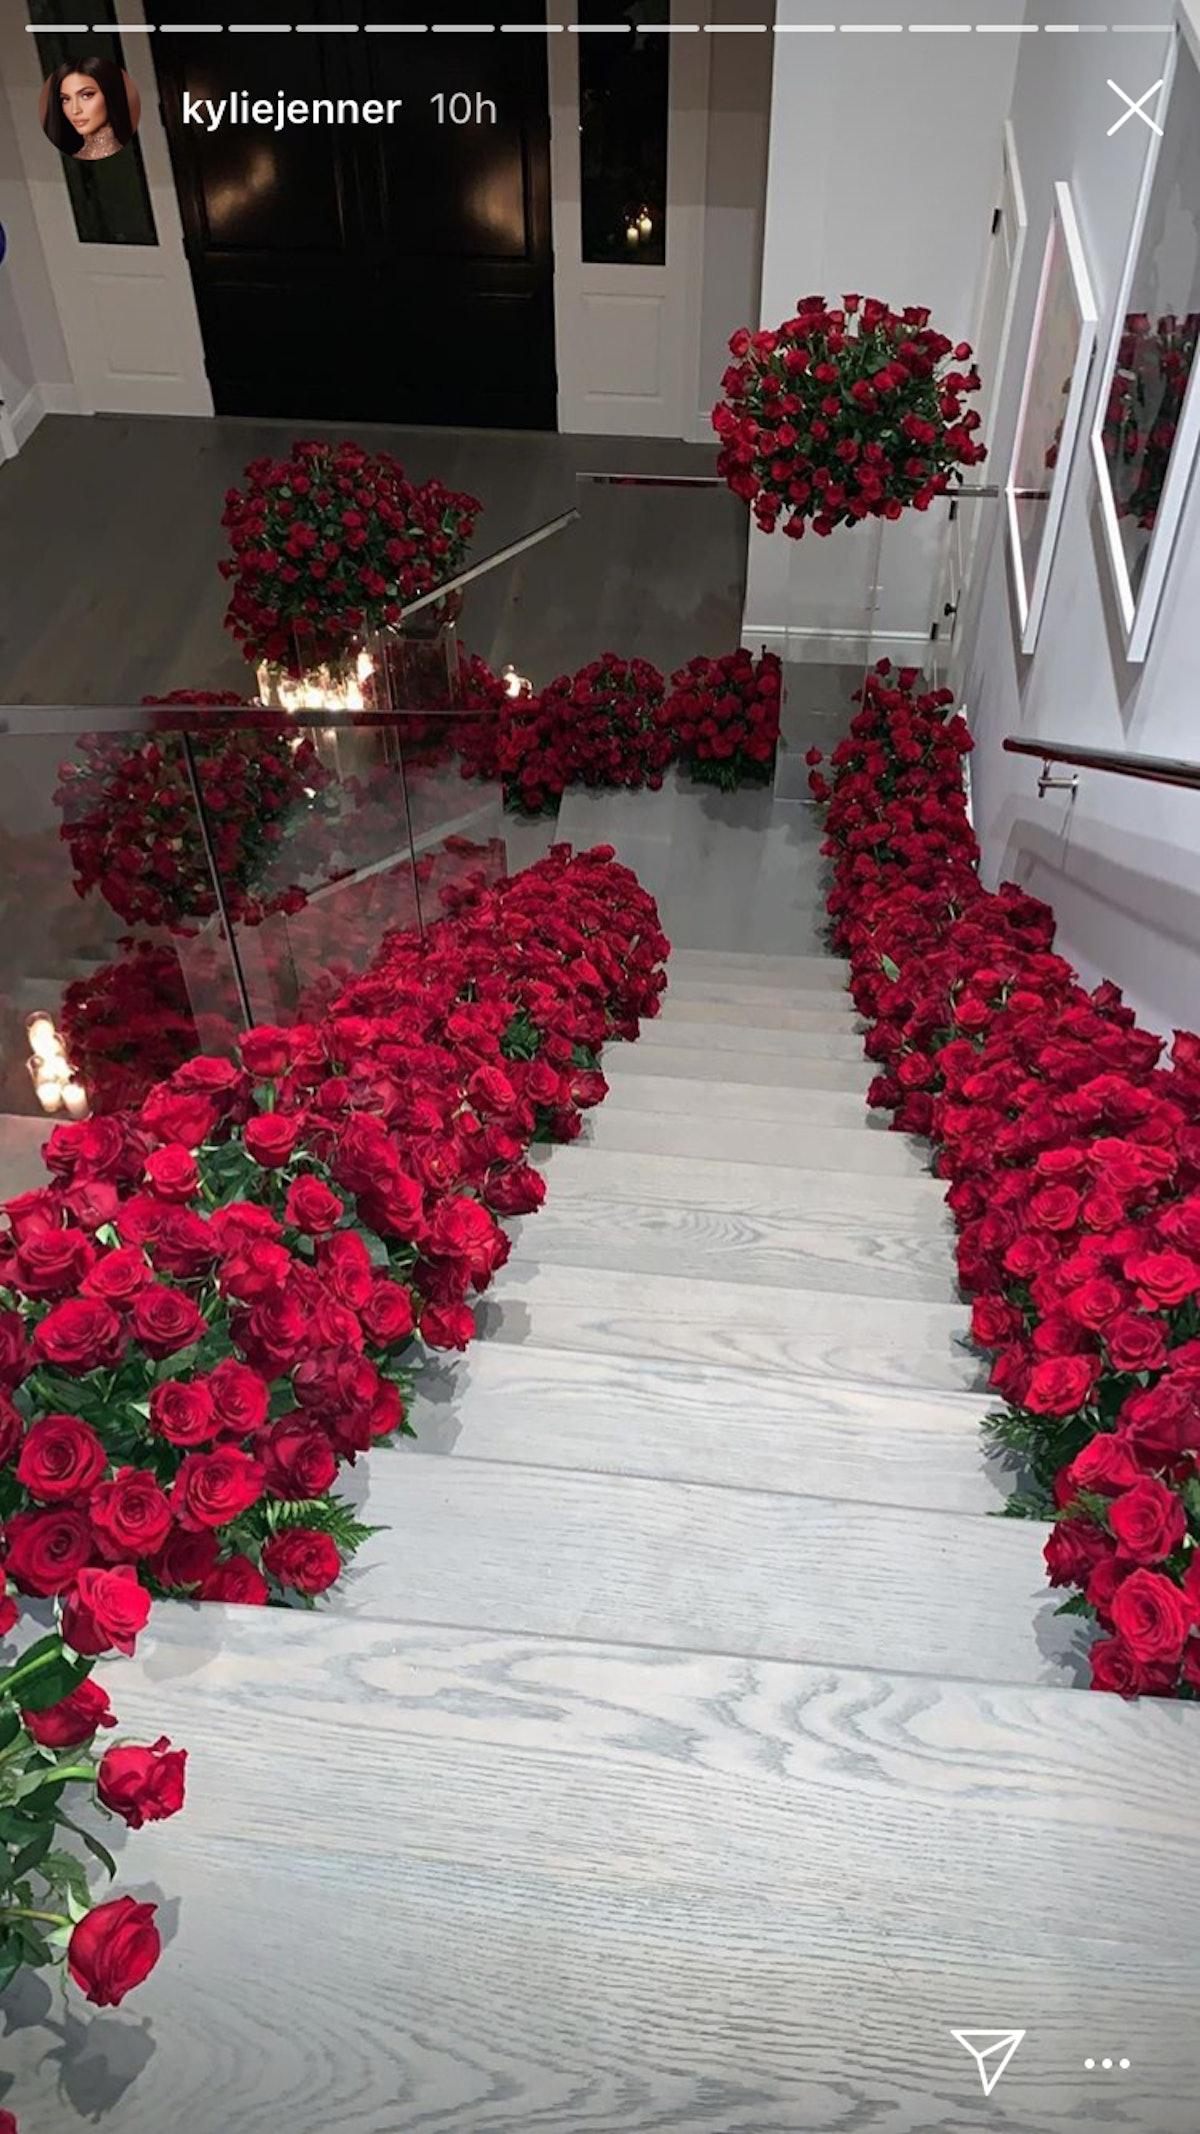 Kylie Jenner roses embed